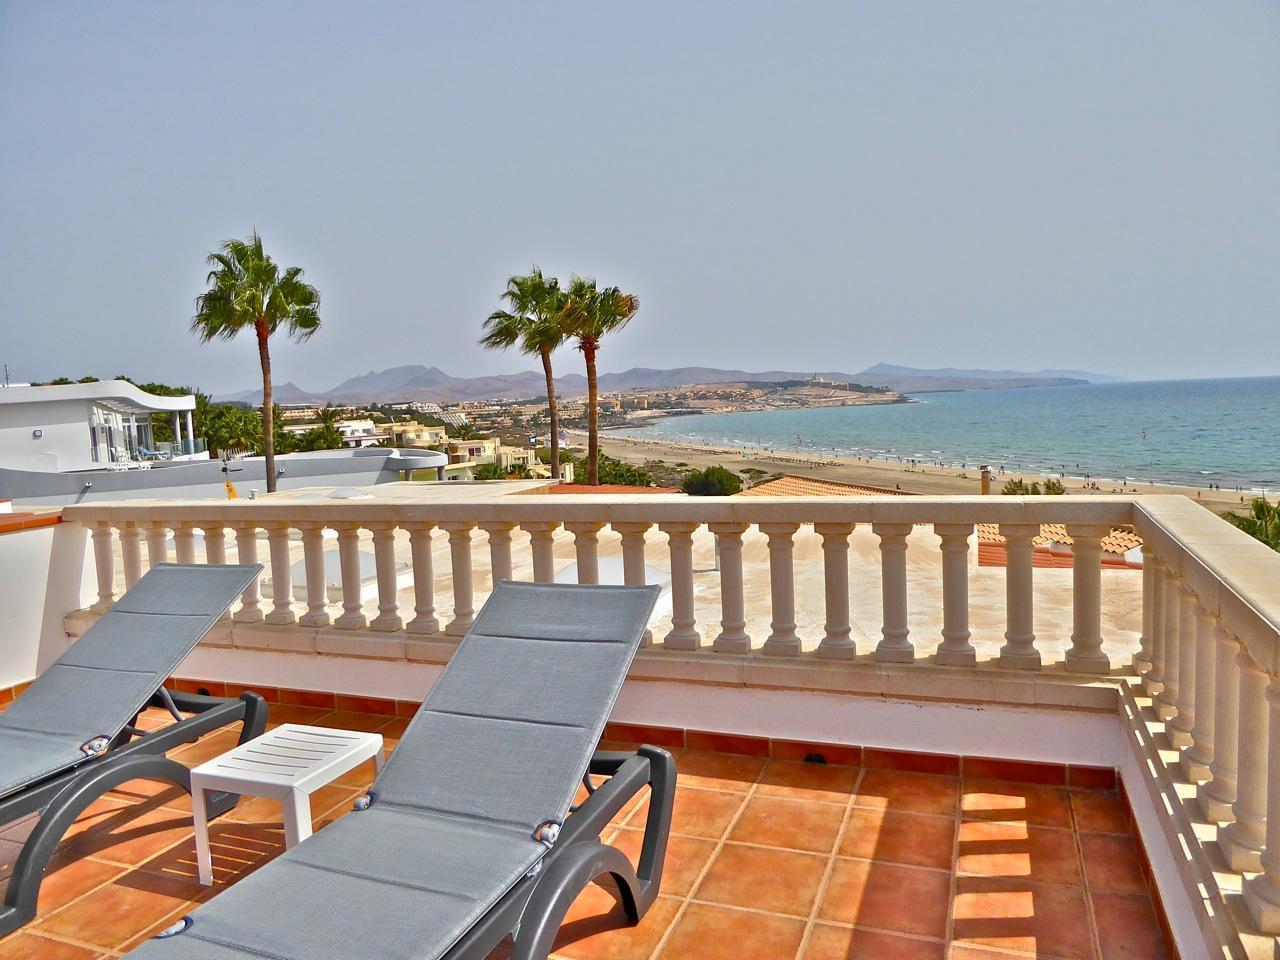 Ferienhaus Ferienhäuser Panorama Jardin PLUS (489054), Costa Calma, Fuerteventura, Kanarische Inseln, Spanien, Bild 7